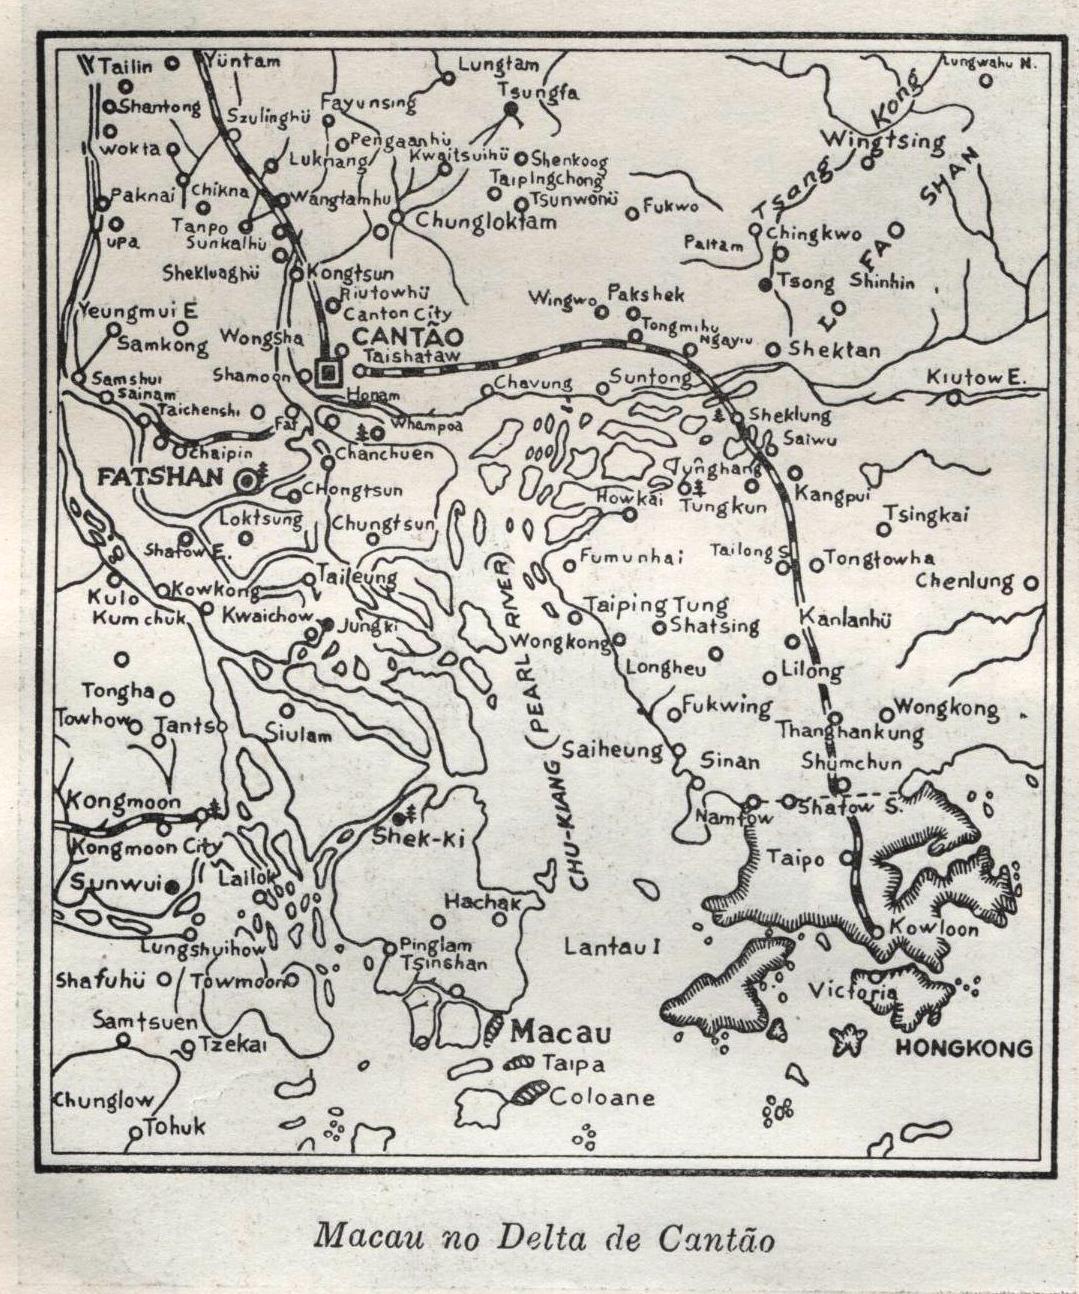 Mapa de Macau 1951 - Semana do Ultramar Português